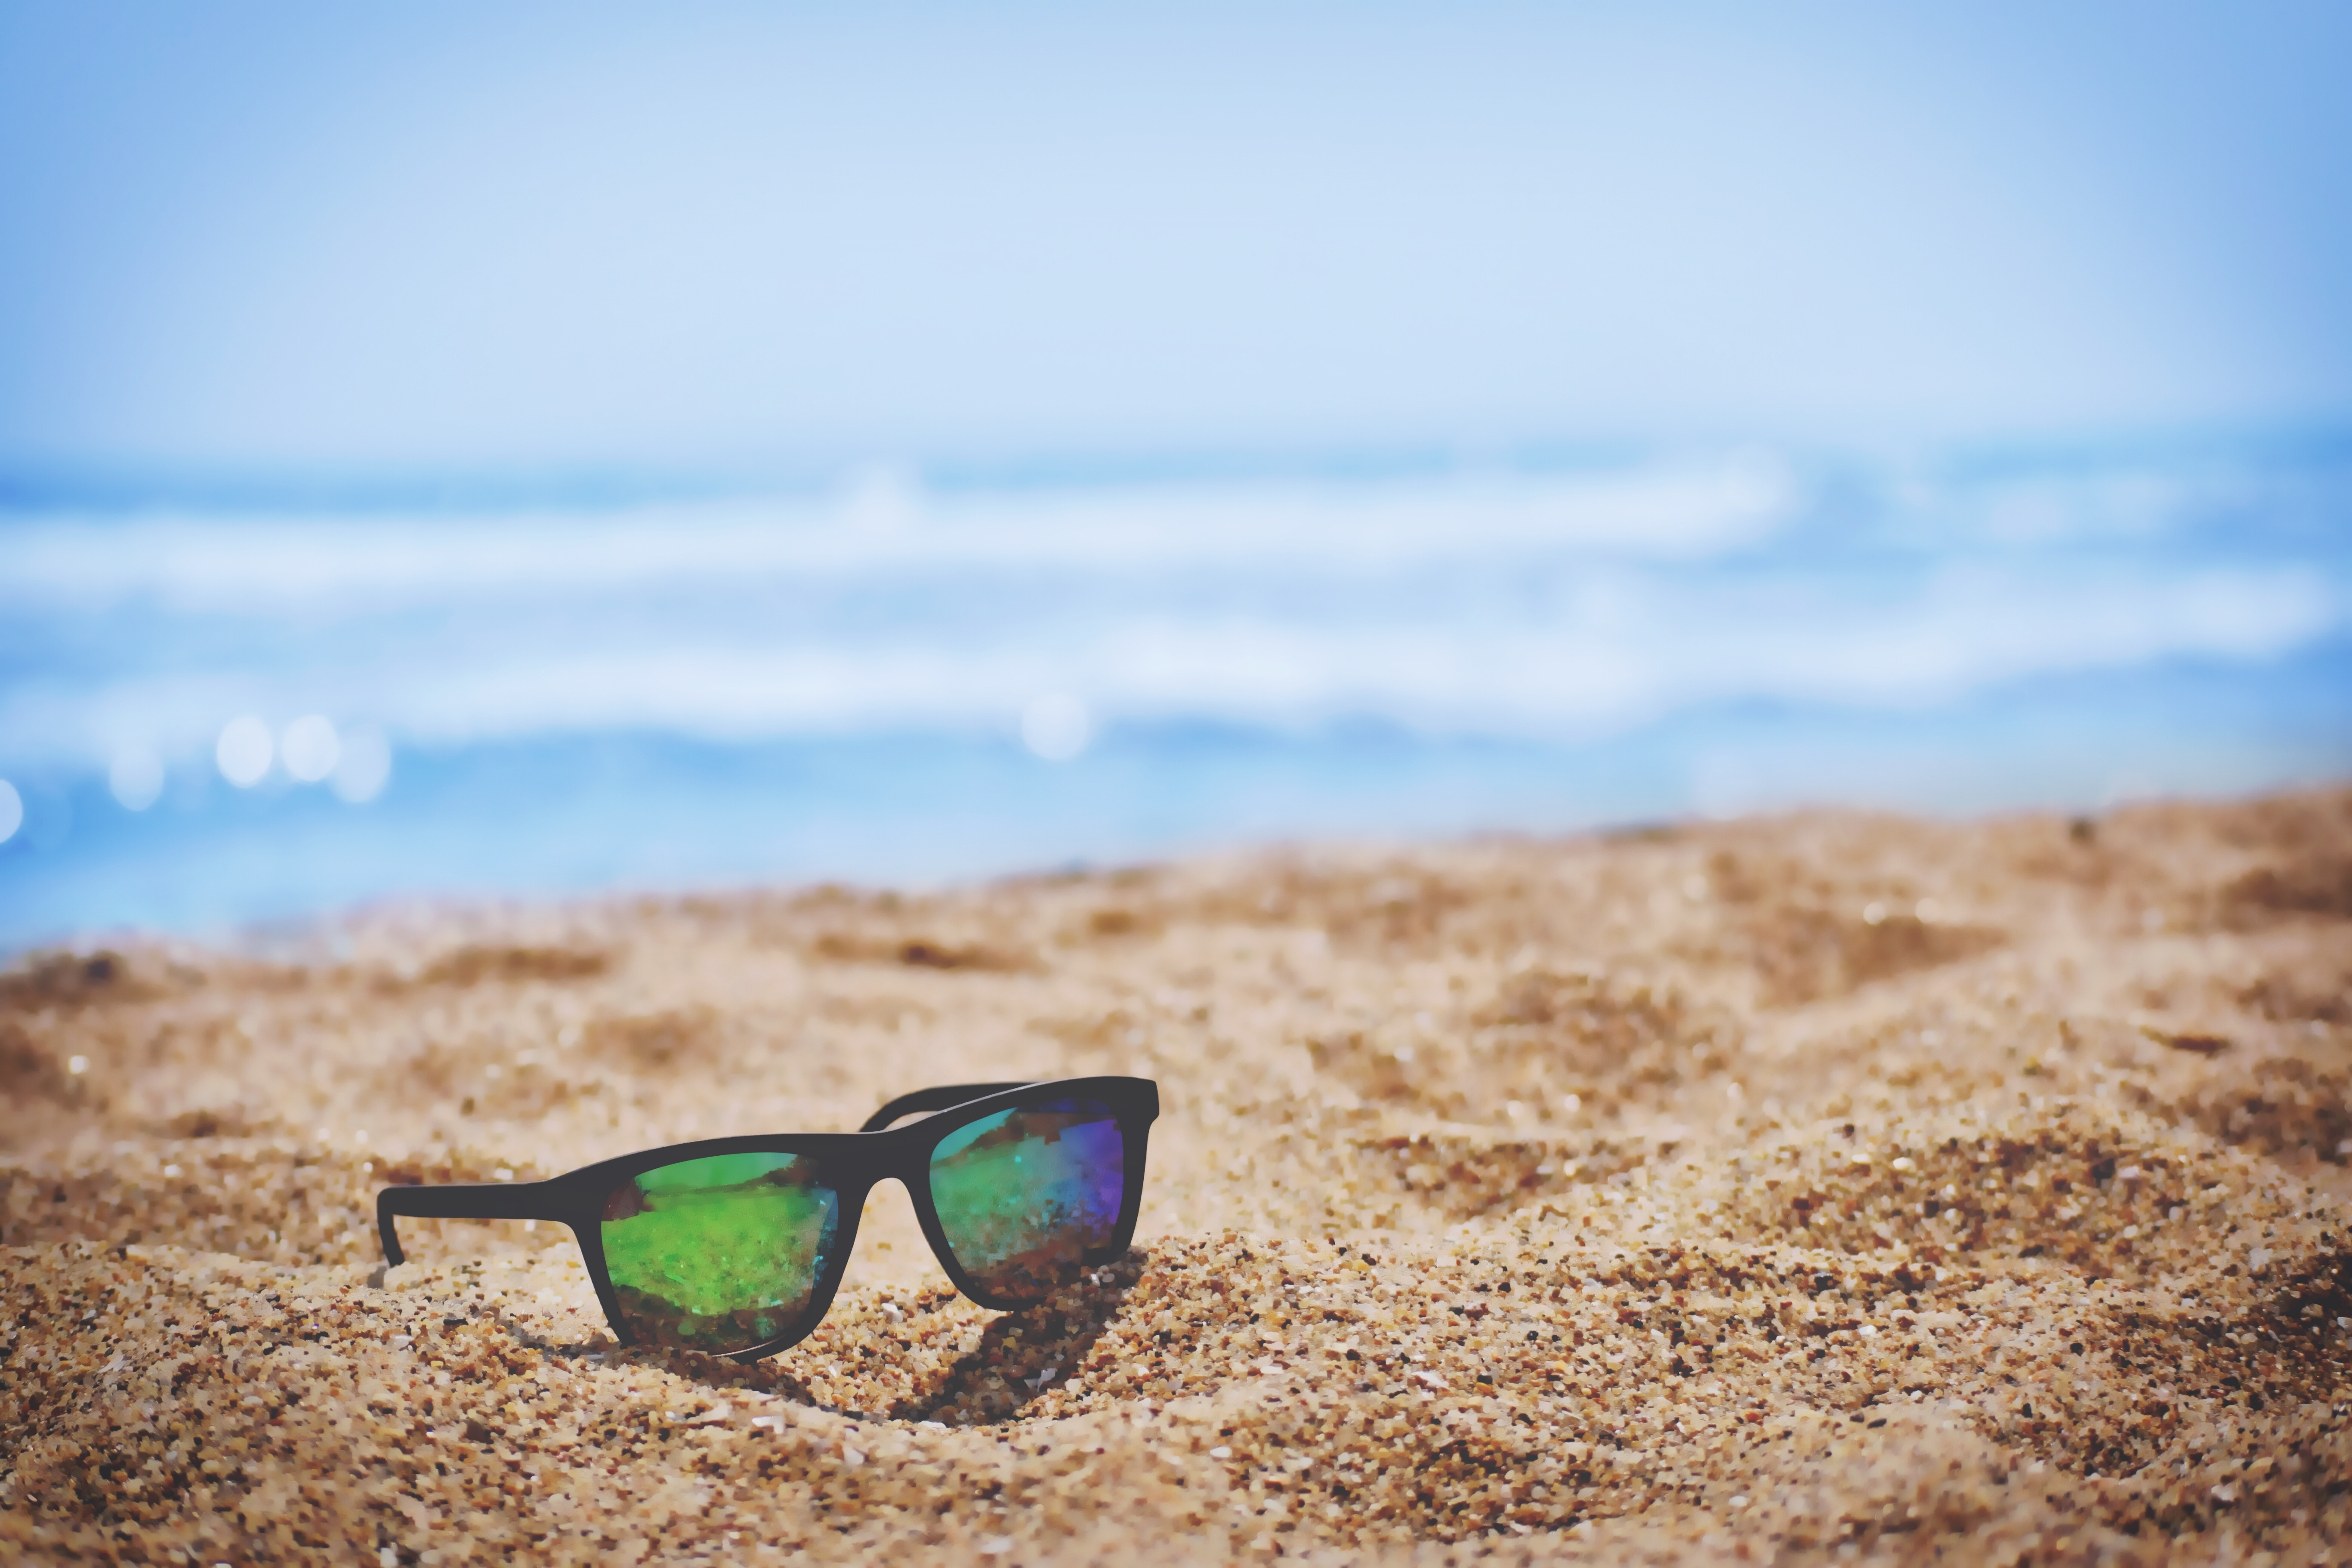 Sunglasses in the sand. Photo by Sai Kiran Anagani on Unsplash.com